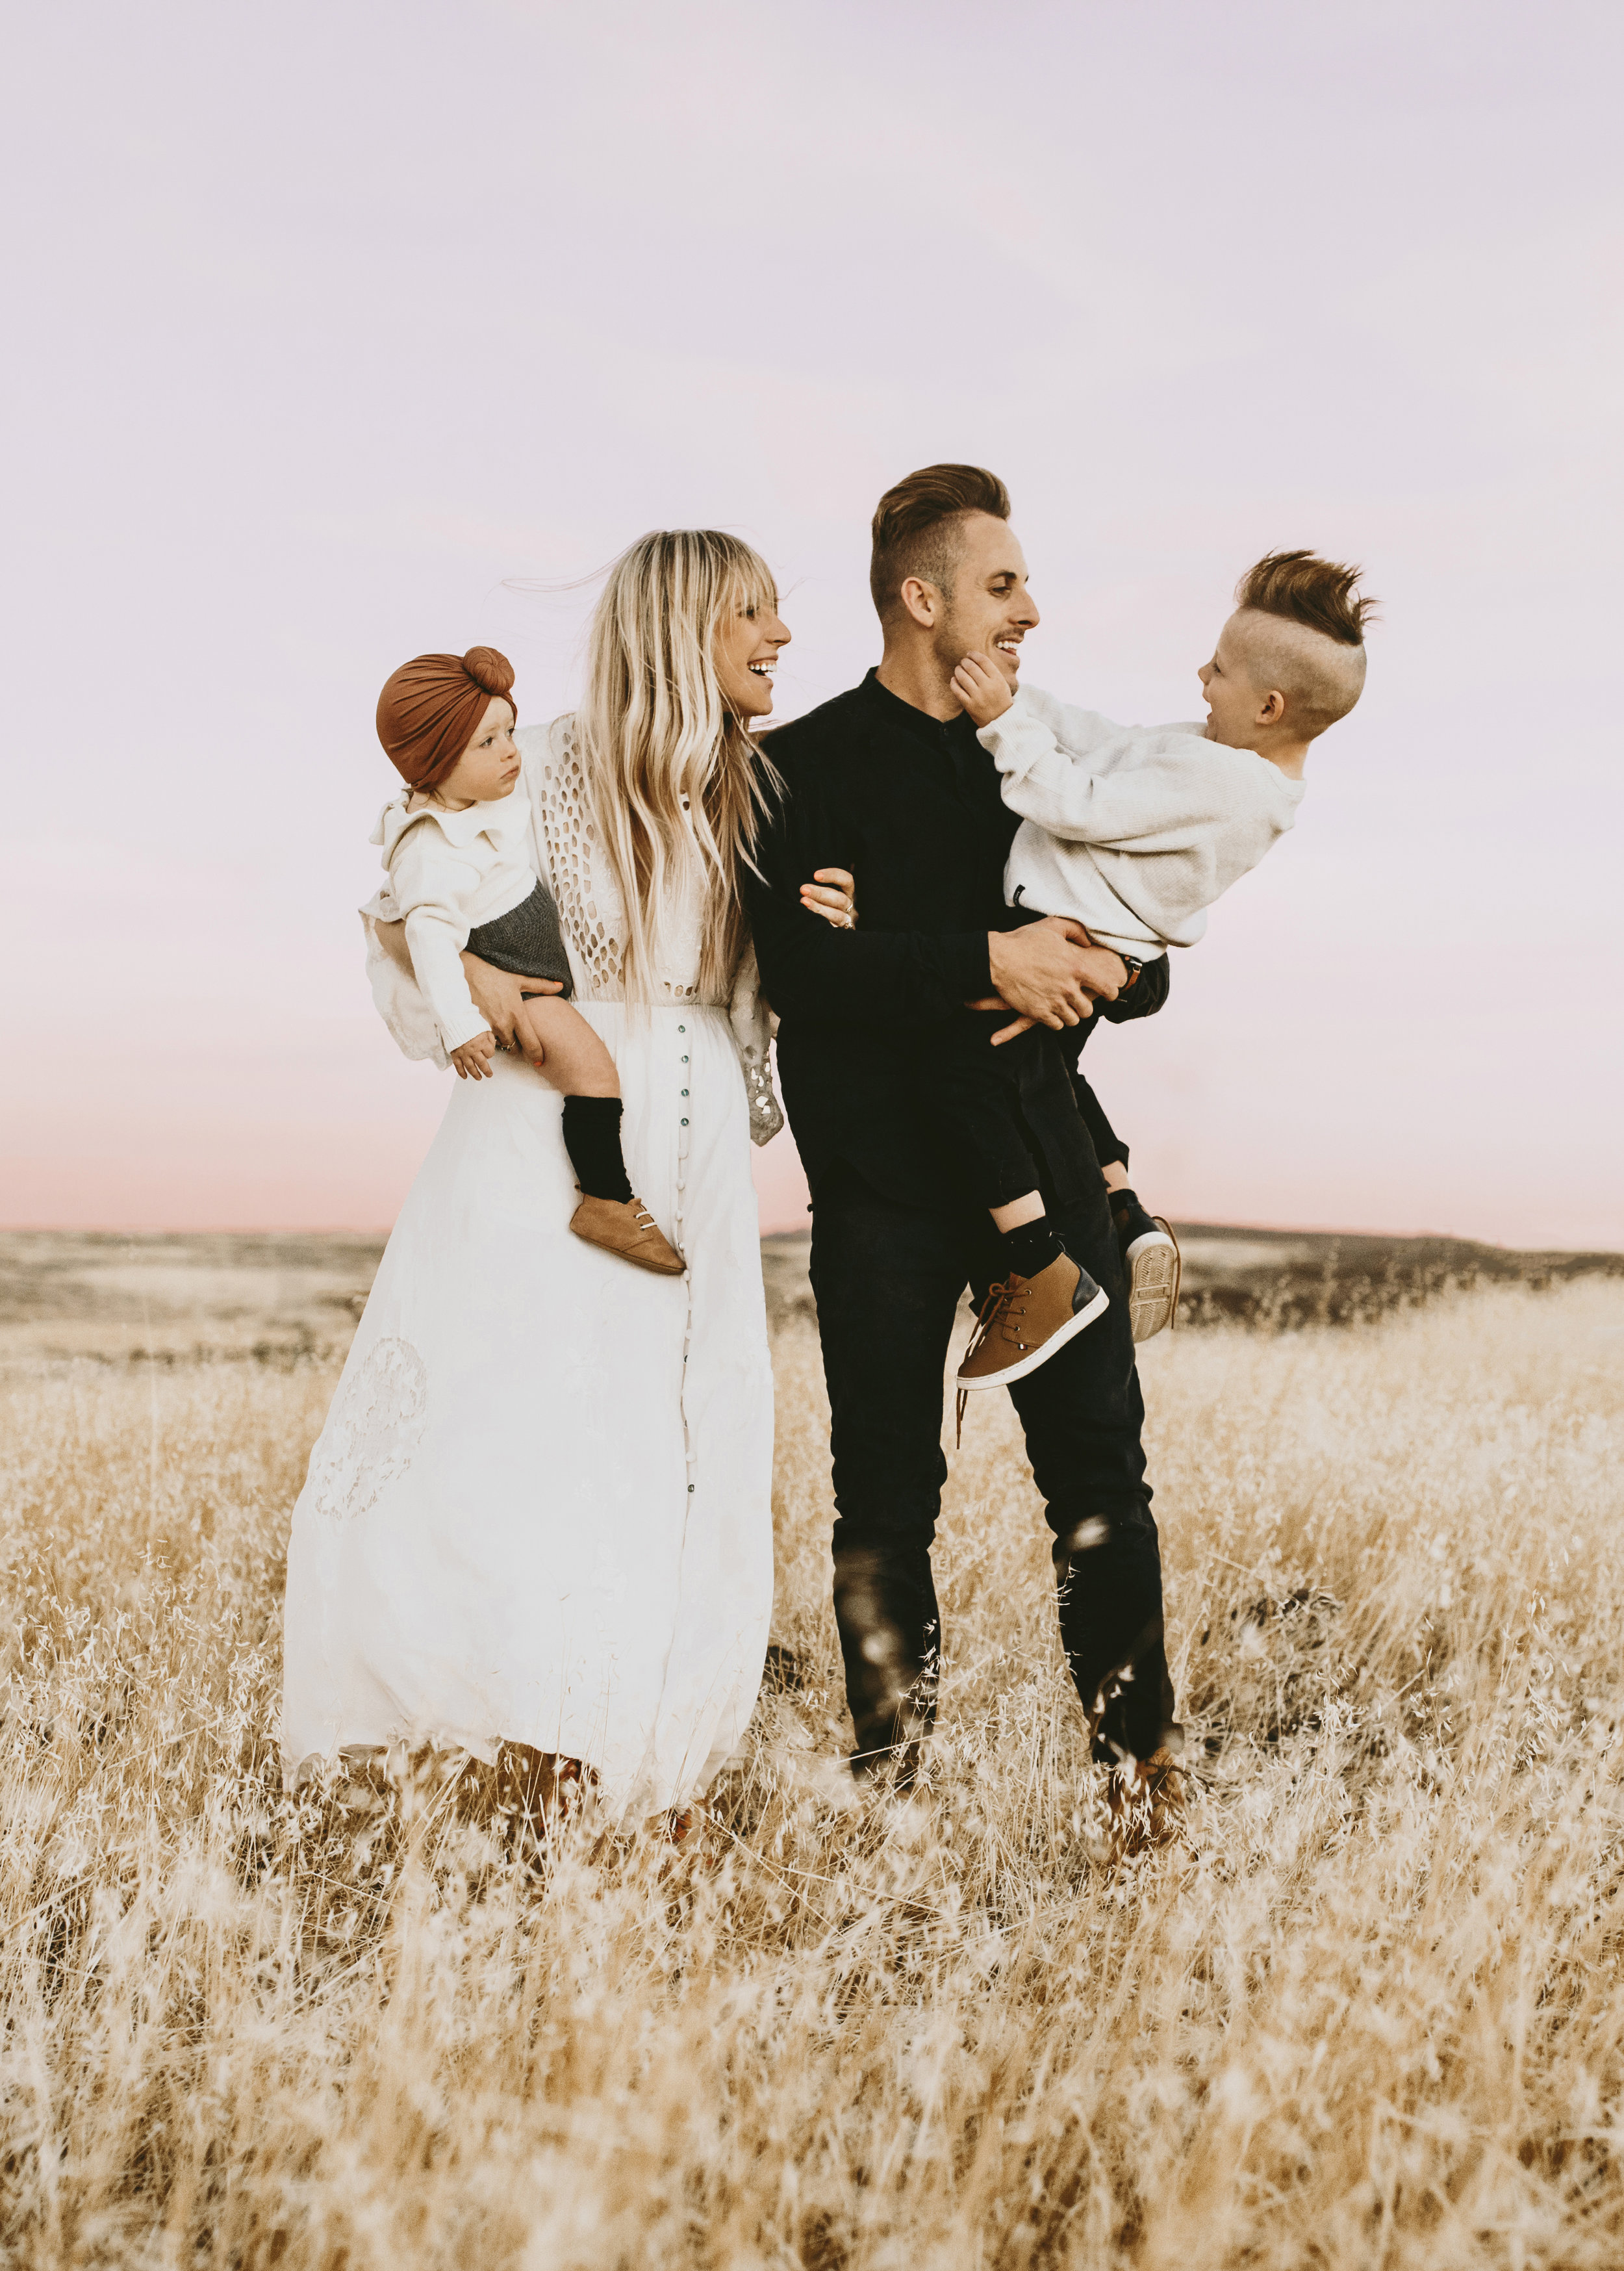 Bailey (Founder), Chase (Husband), Lennon (Daughter), Banks (Son)